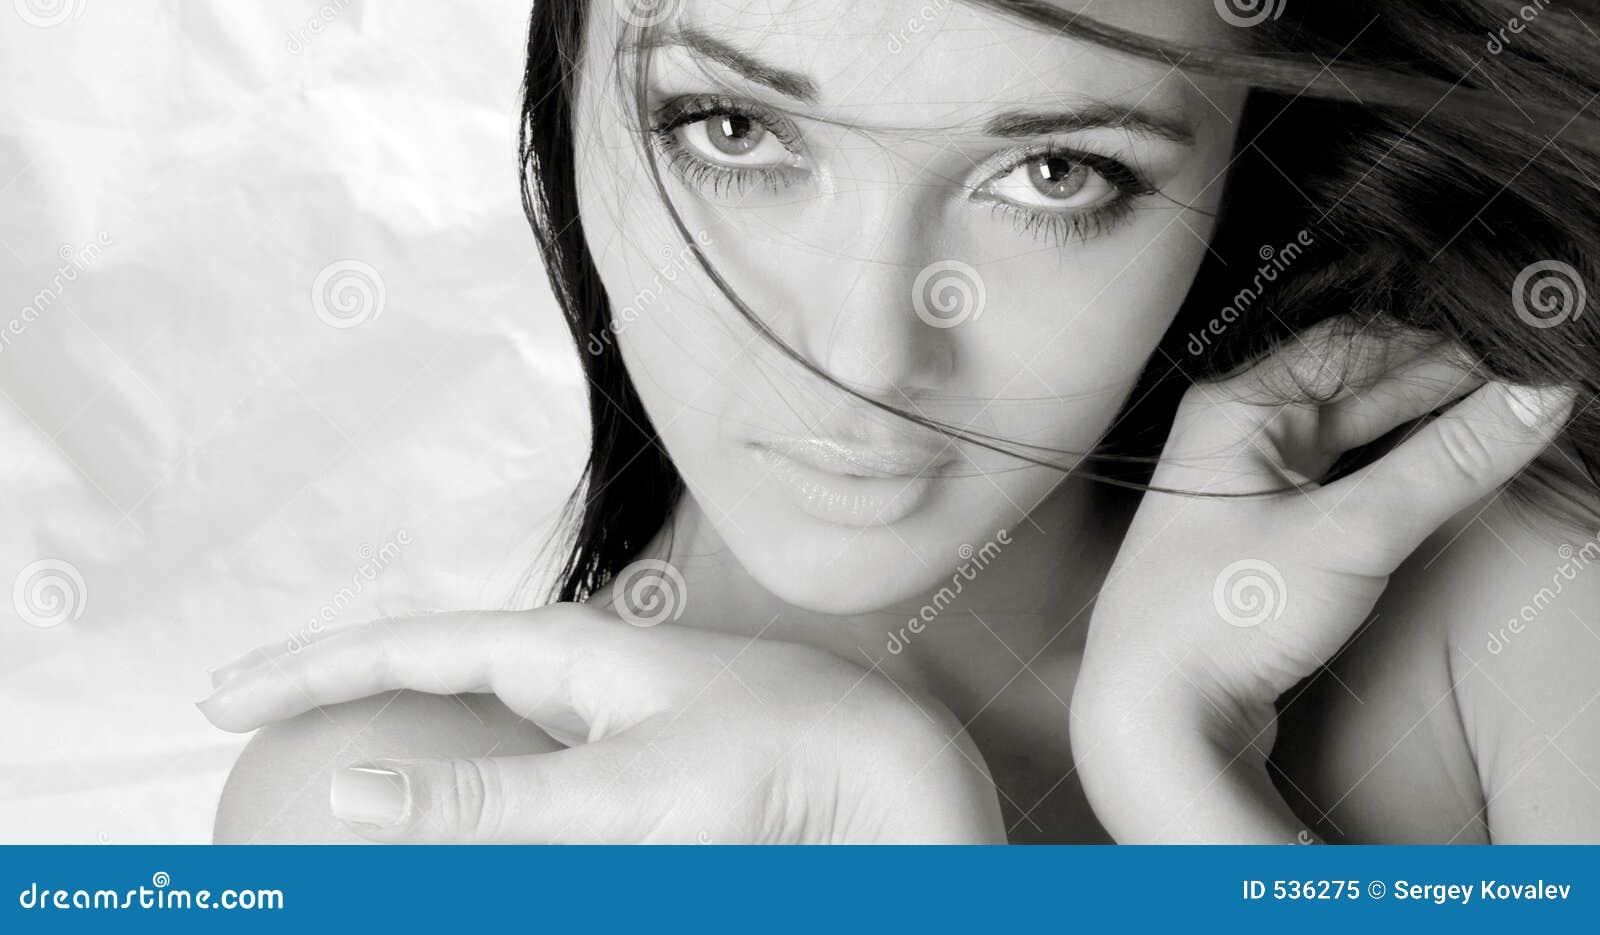 Download 女孩纵向 库存图片. 图片 包括有 新鲜, 别致, 重婚, beauvoir, 特写镜头, 全能, 女性, 眼睛 - 536275